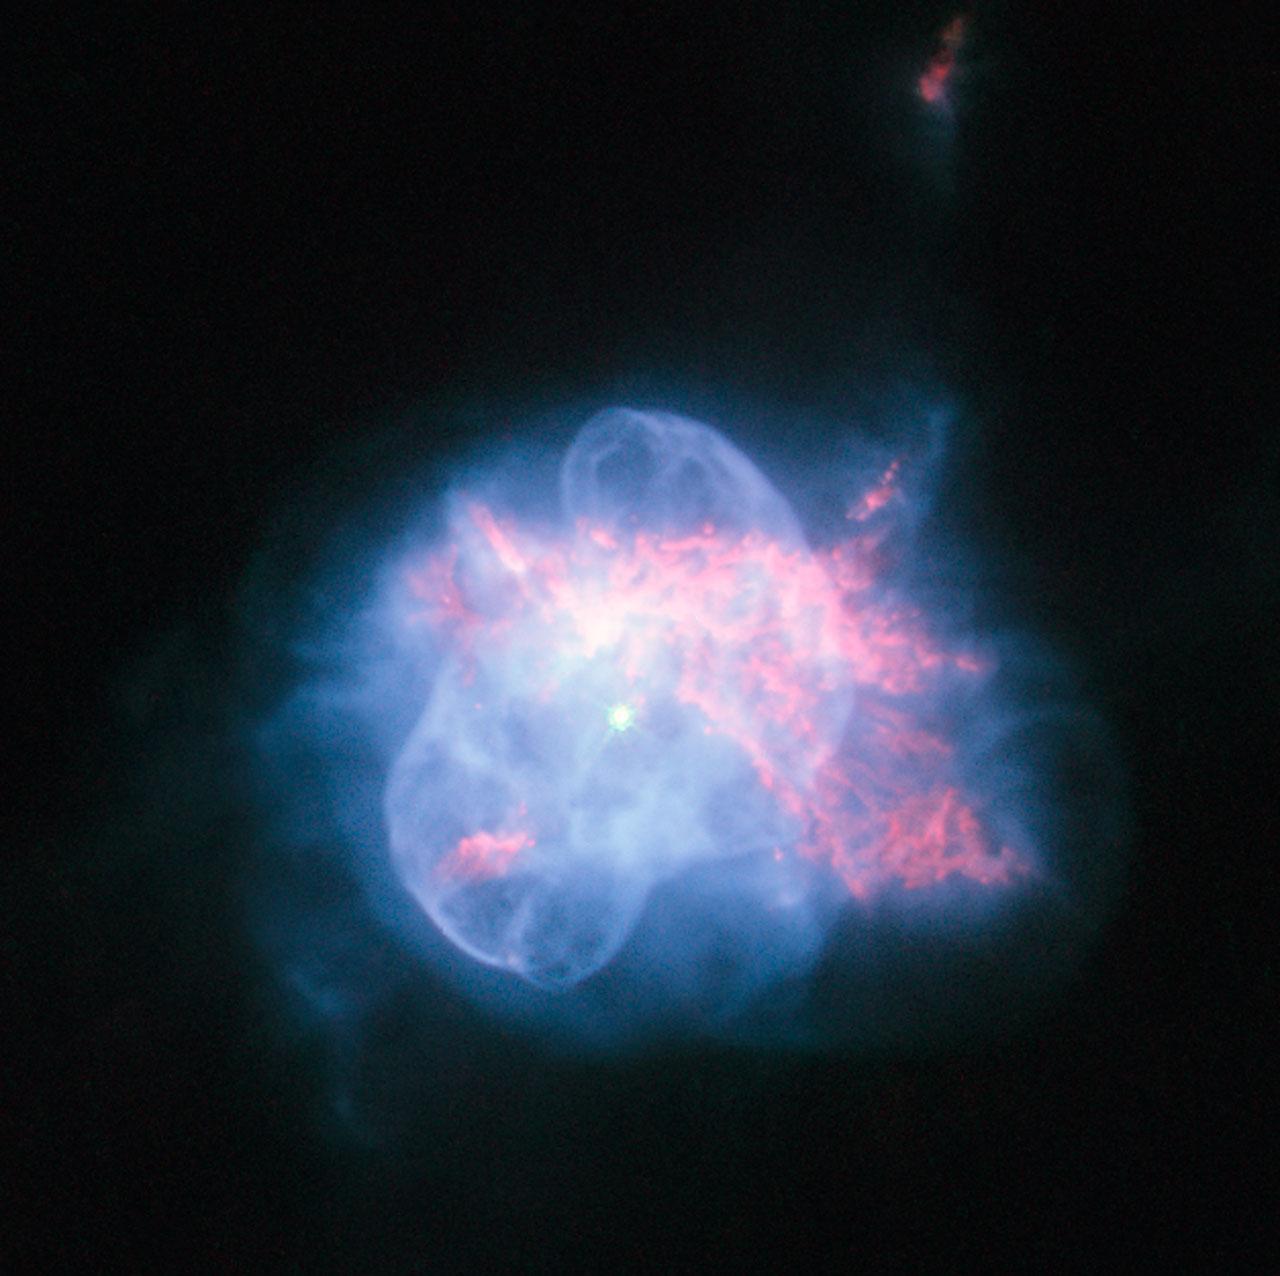 An odd planetary nebula in Hercules | ESA/Hubble